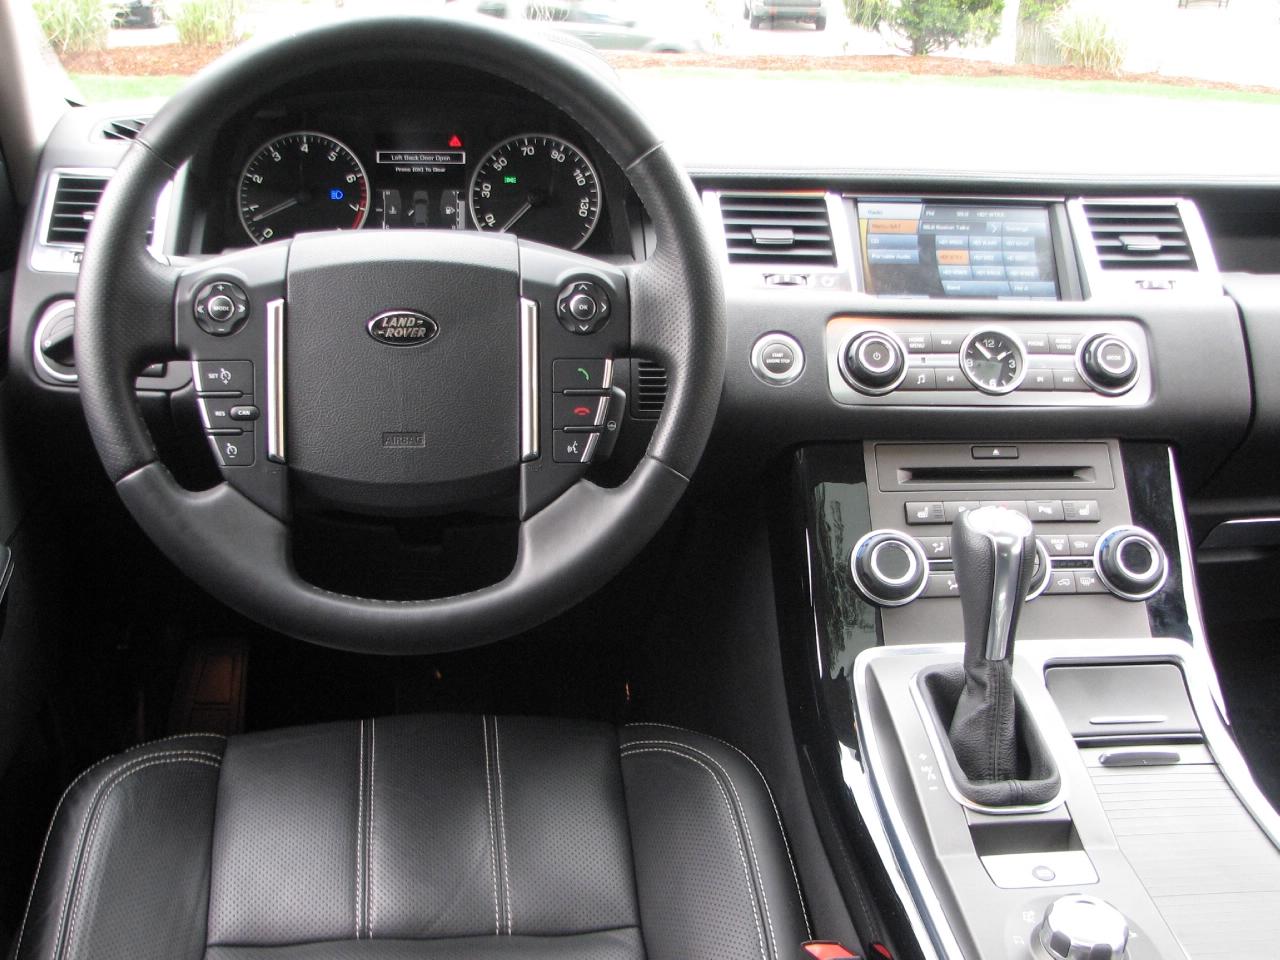 2010 Land Rover Range Rover Sport Pictures Cargurus